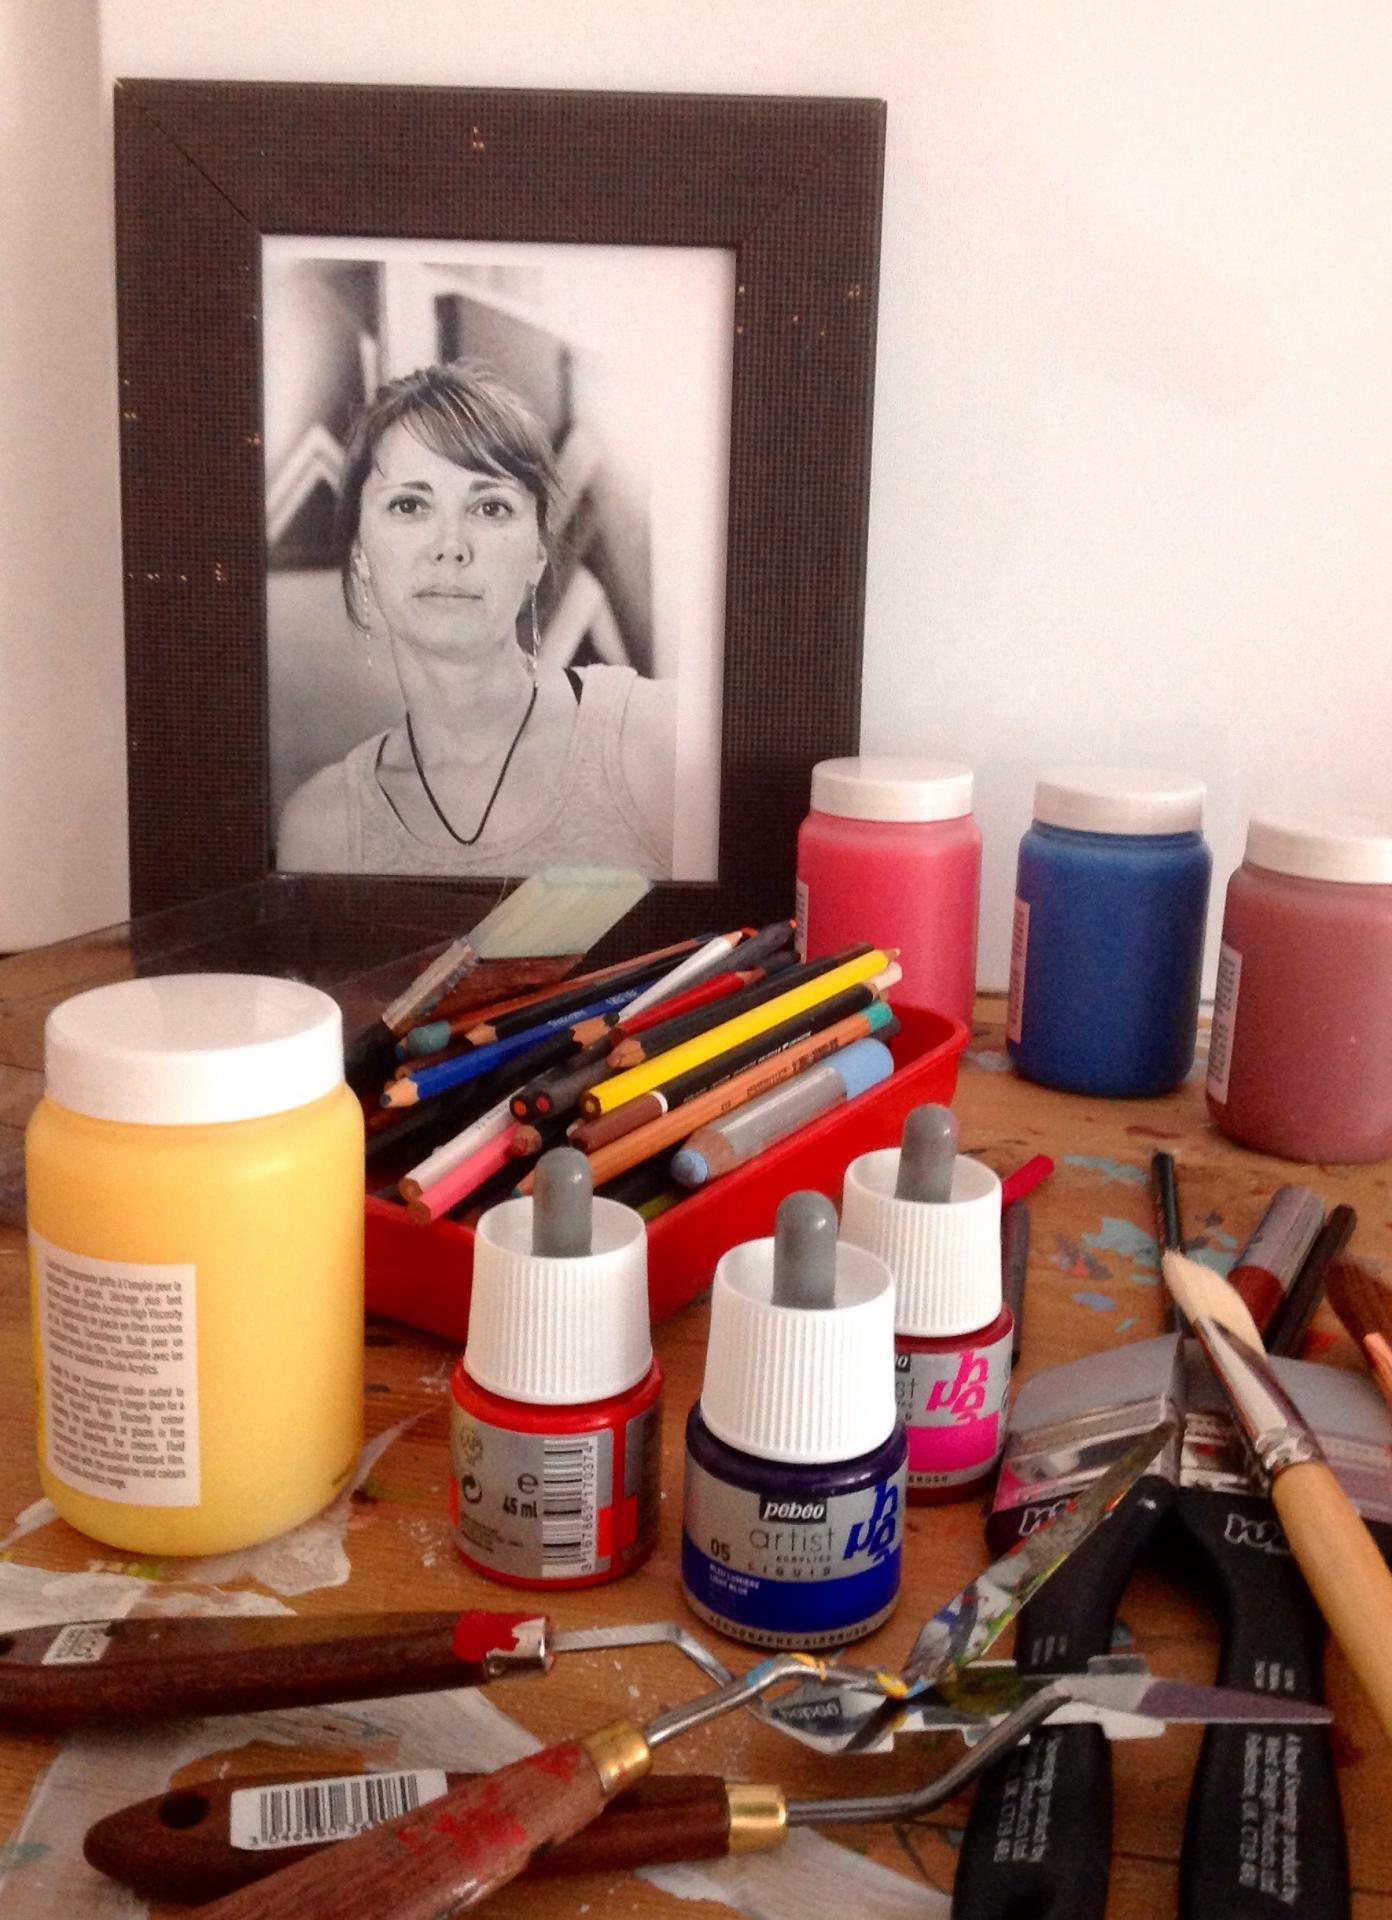 Atelier d'Annecy